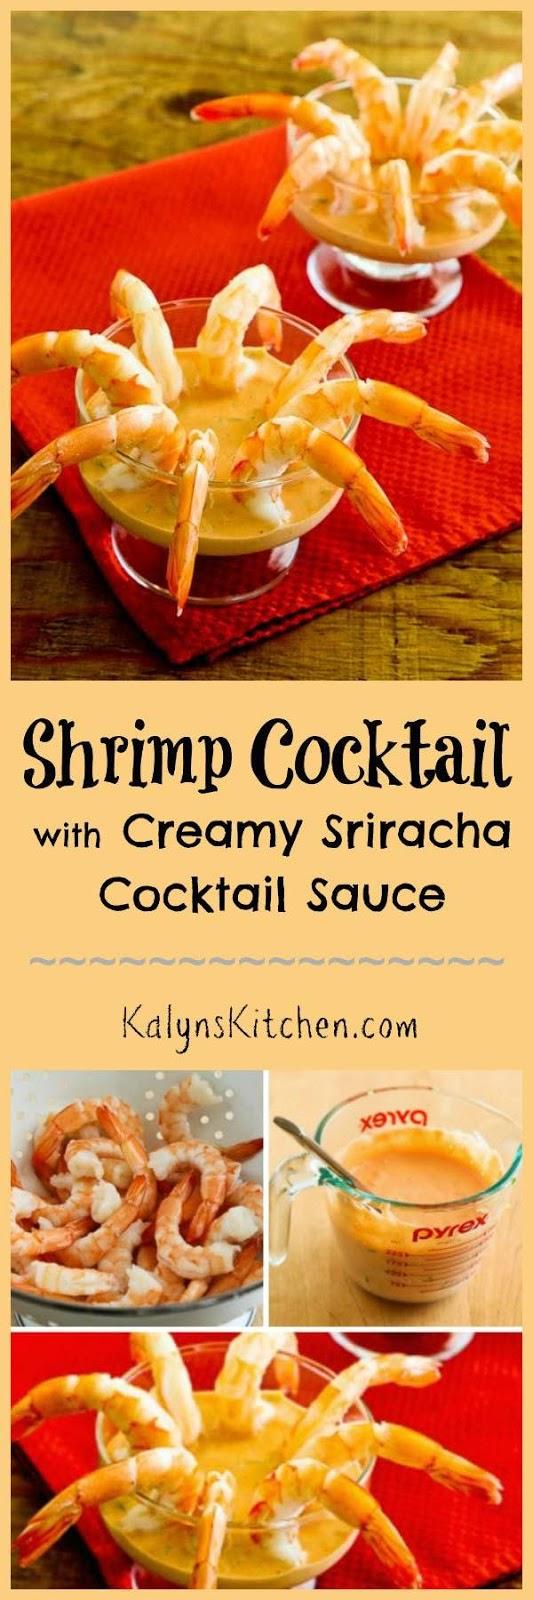 Shrimp Cocktail with Low Sugar Cocktail Sauce ~ Kalyn's Kitchen